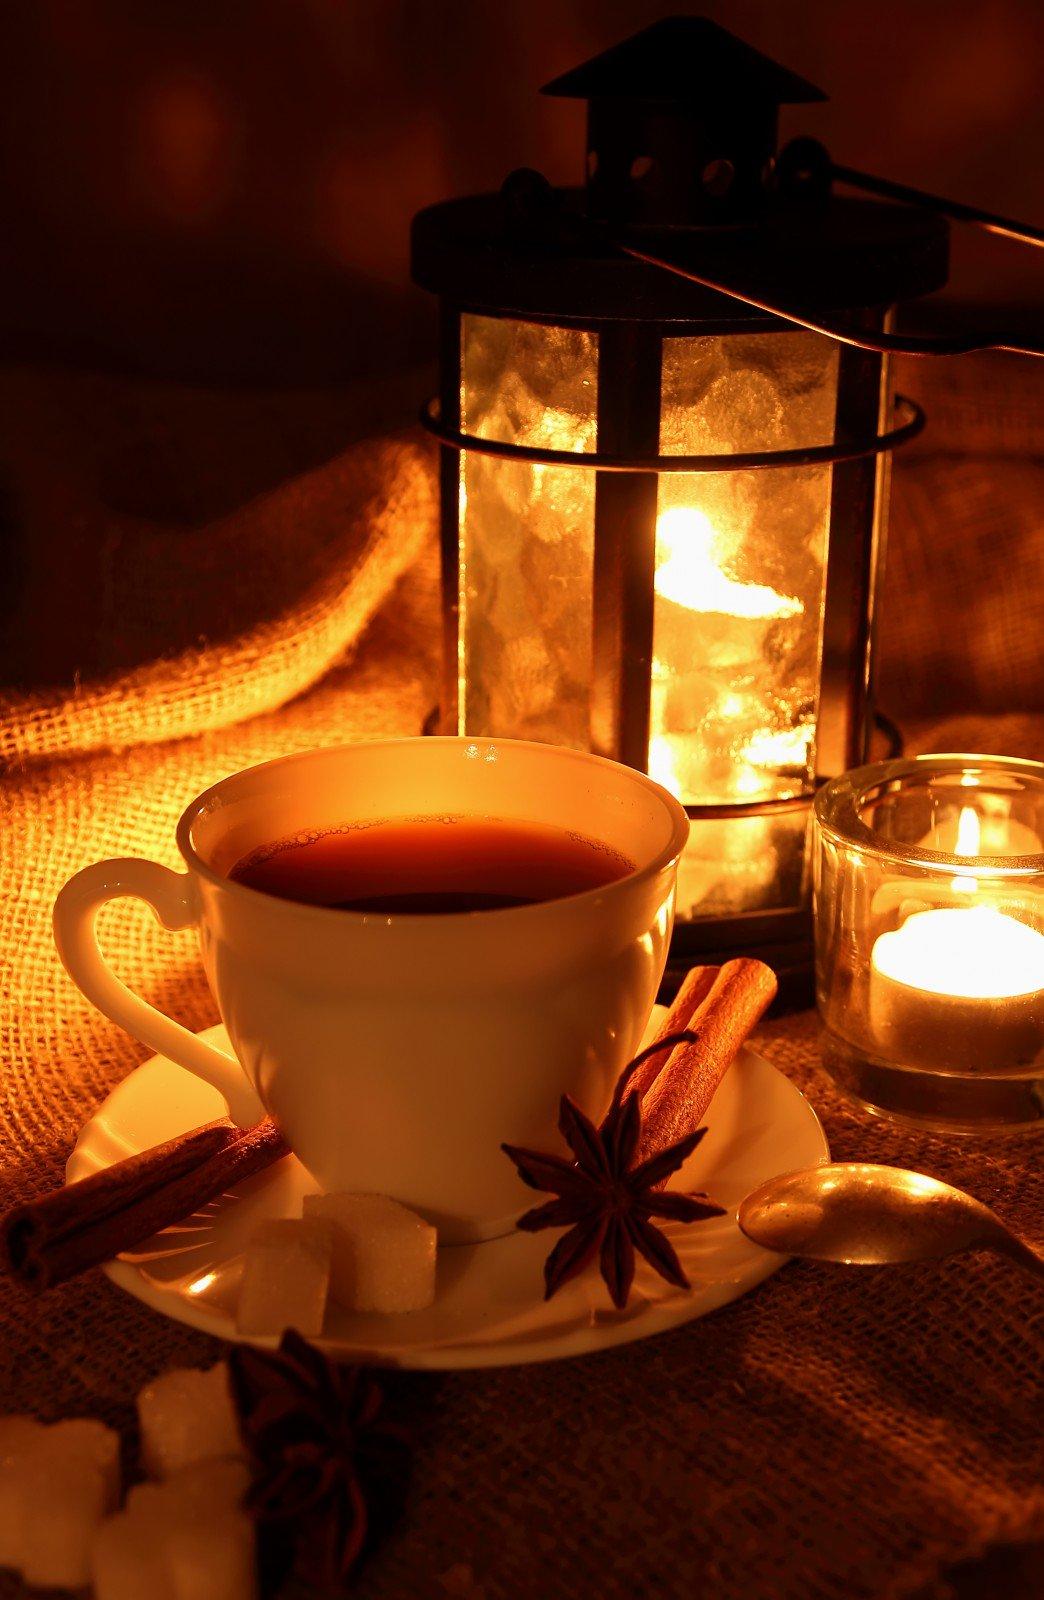 Картинки вечерний кофе на двоих